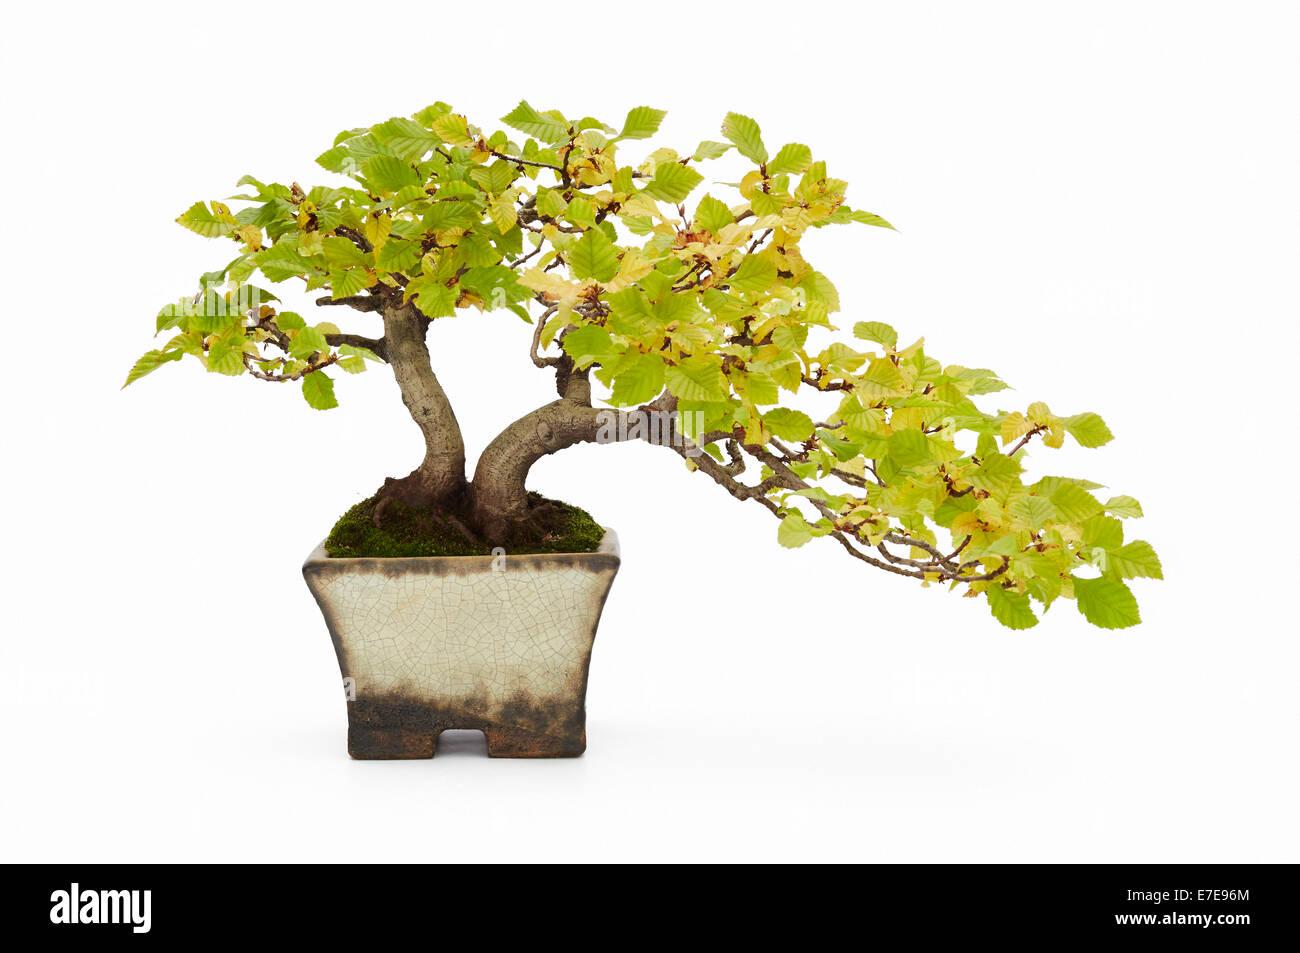 Bonsai Carpinus betulus (European Hornbeam) - Stock Image